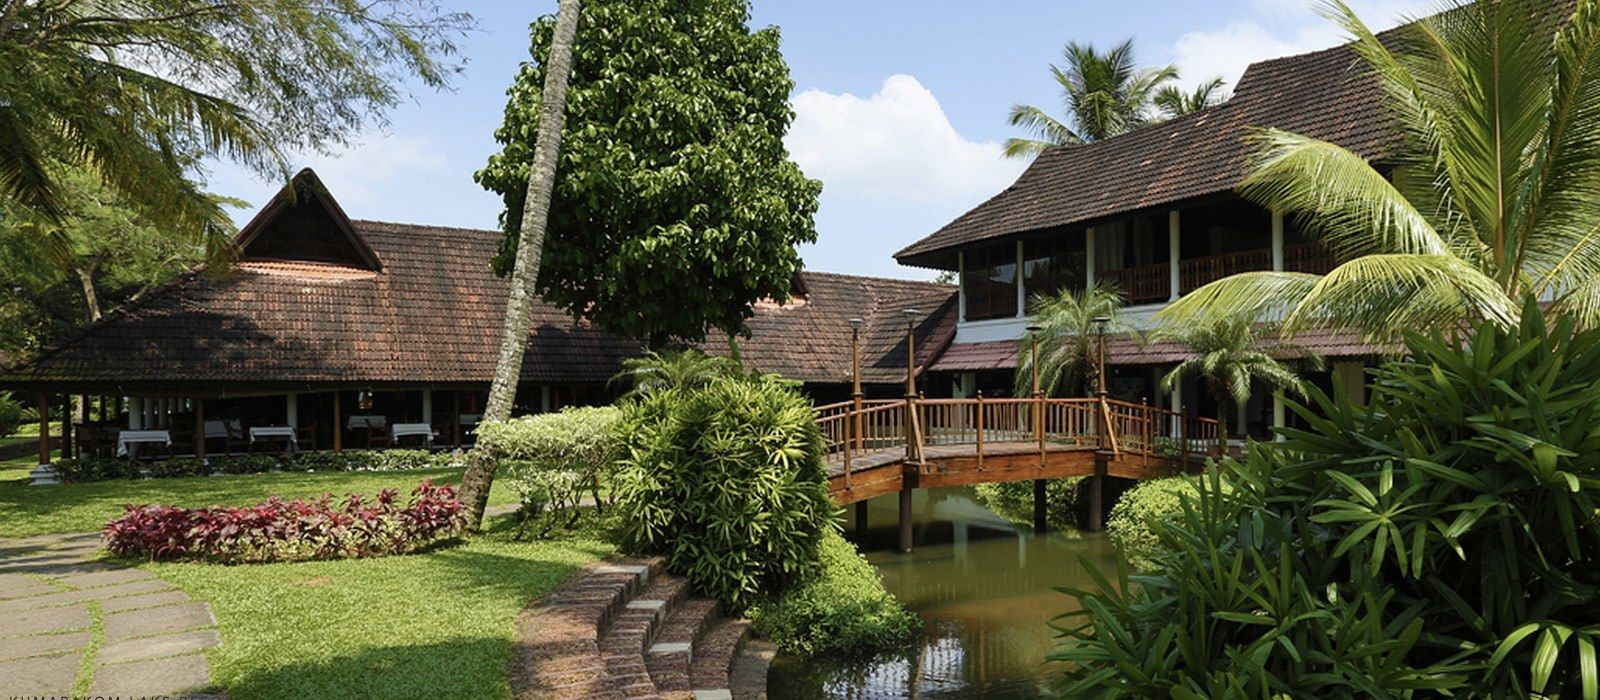 Kumarakom Lake Resort Hotel In South India Enchanting Travels